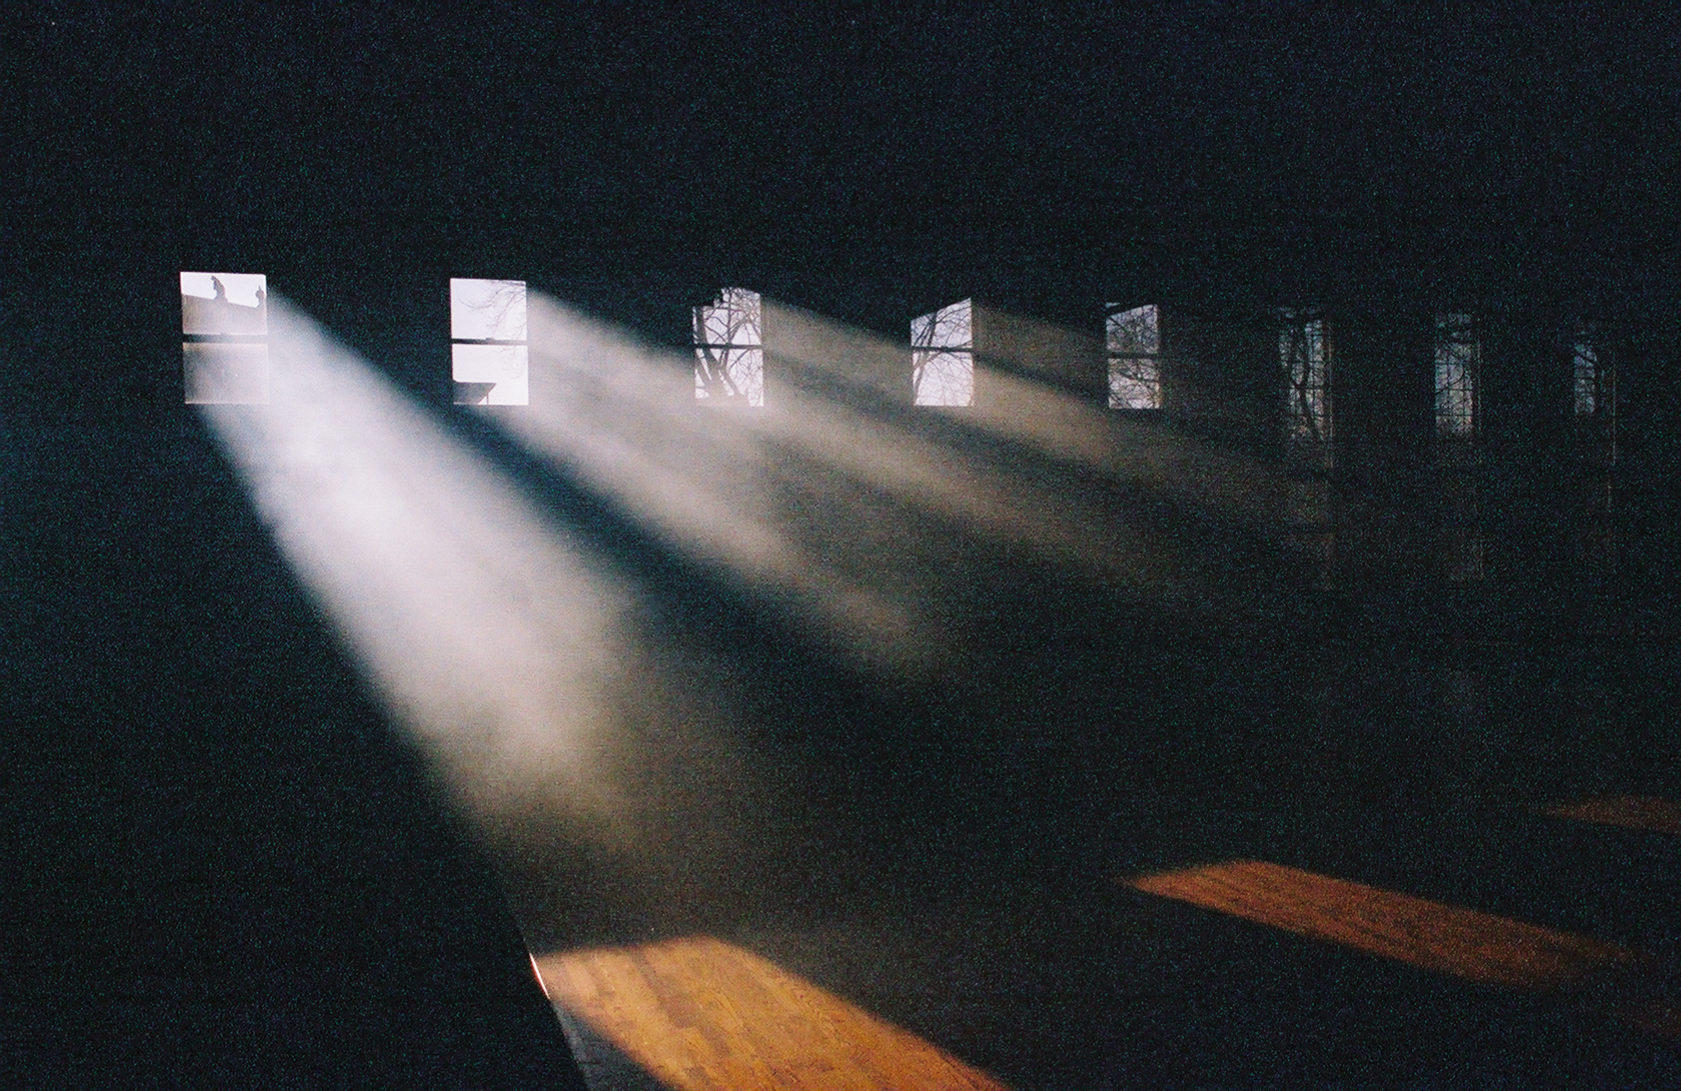 Dark room with light through window - Light Shining Through Windows By Sk8erteck Light Shining Through Windows By Sk8erteck